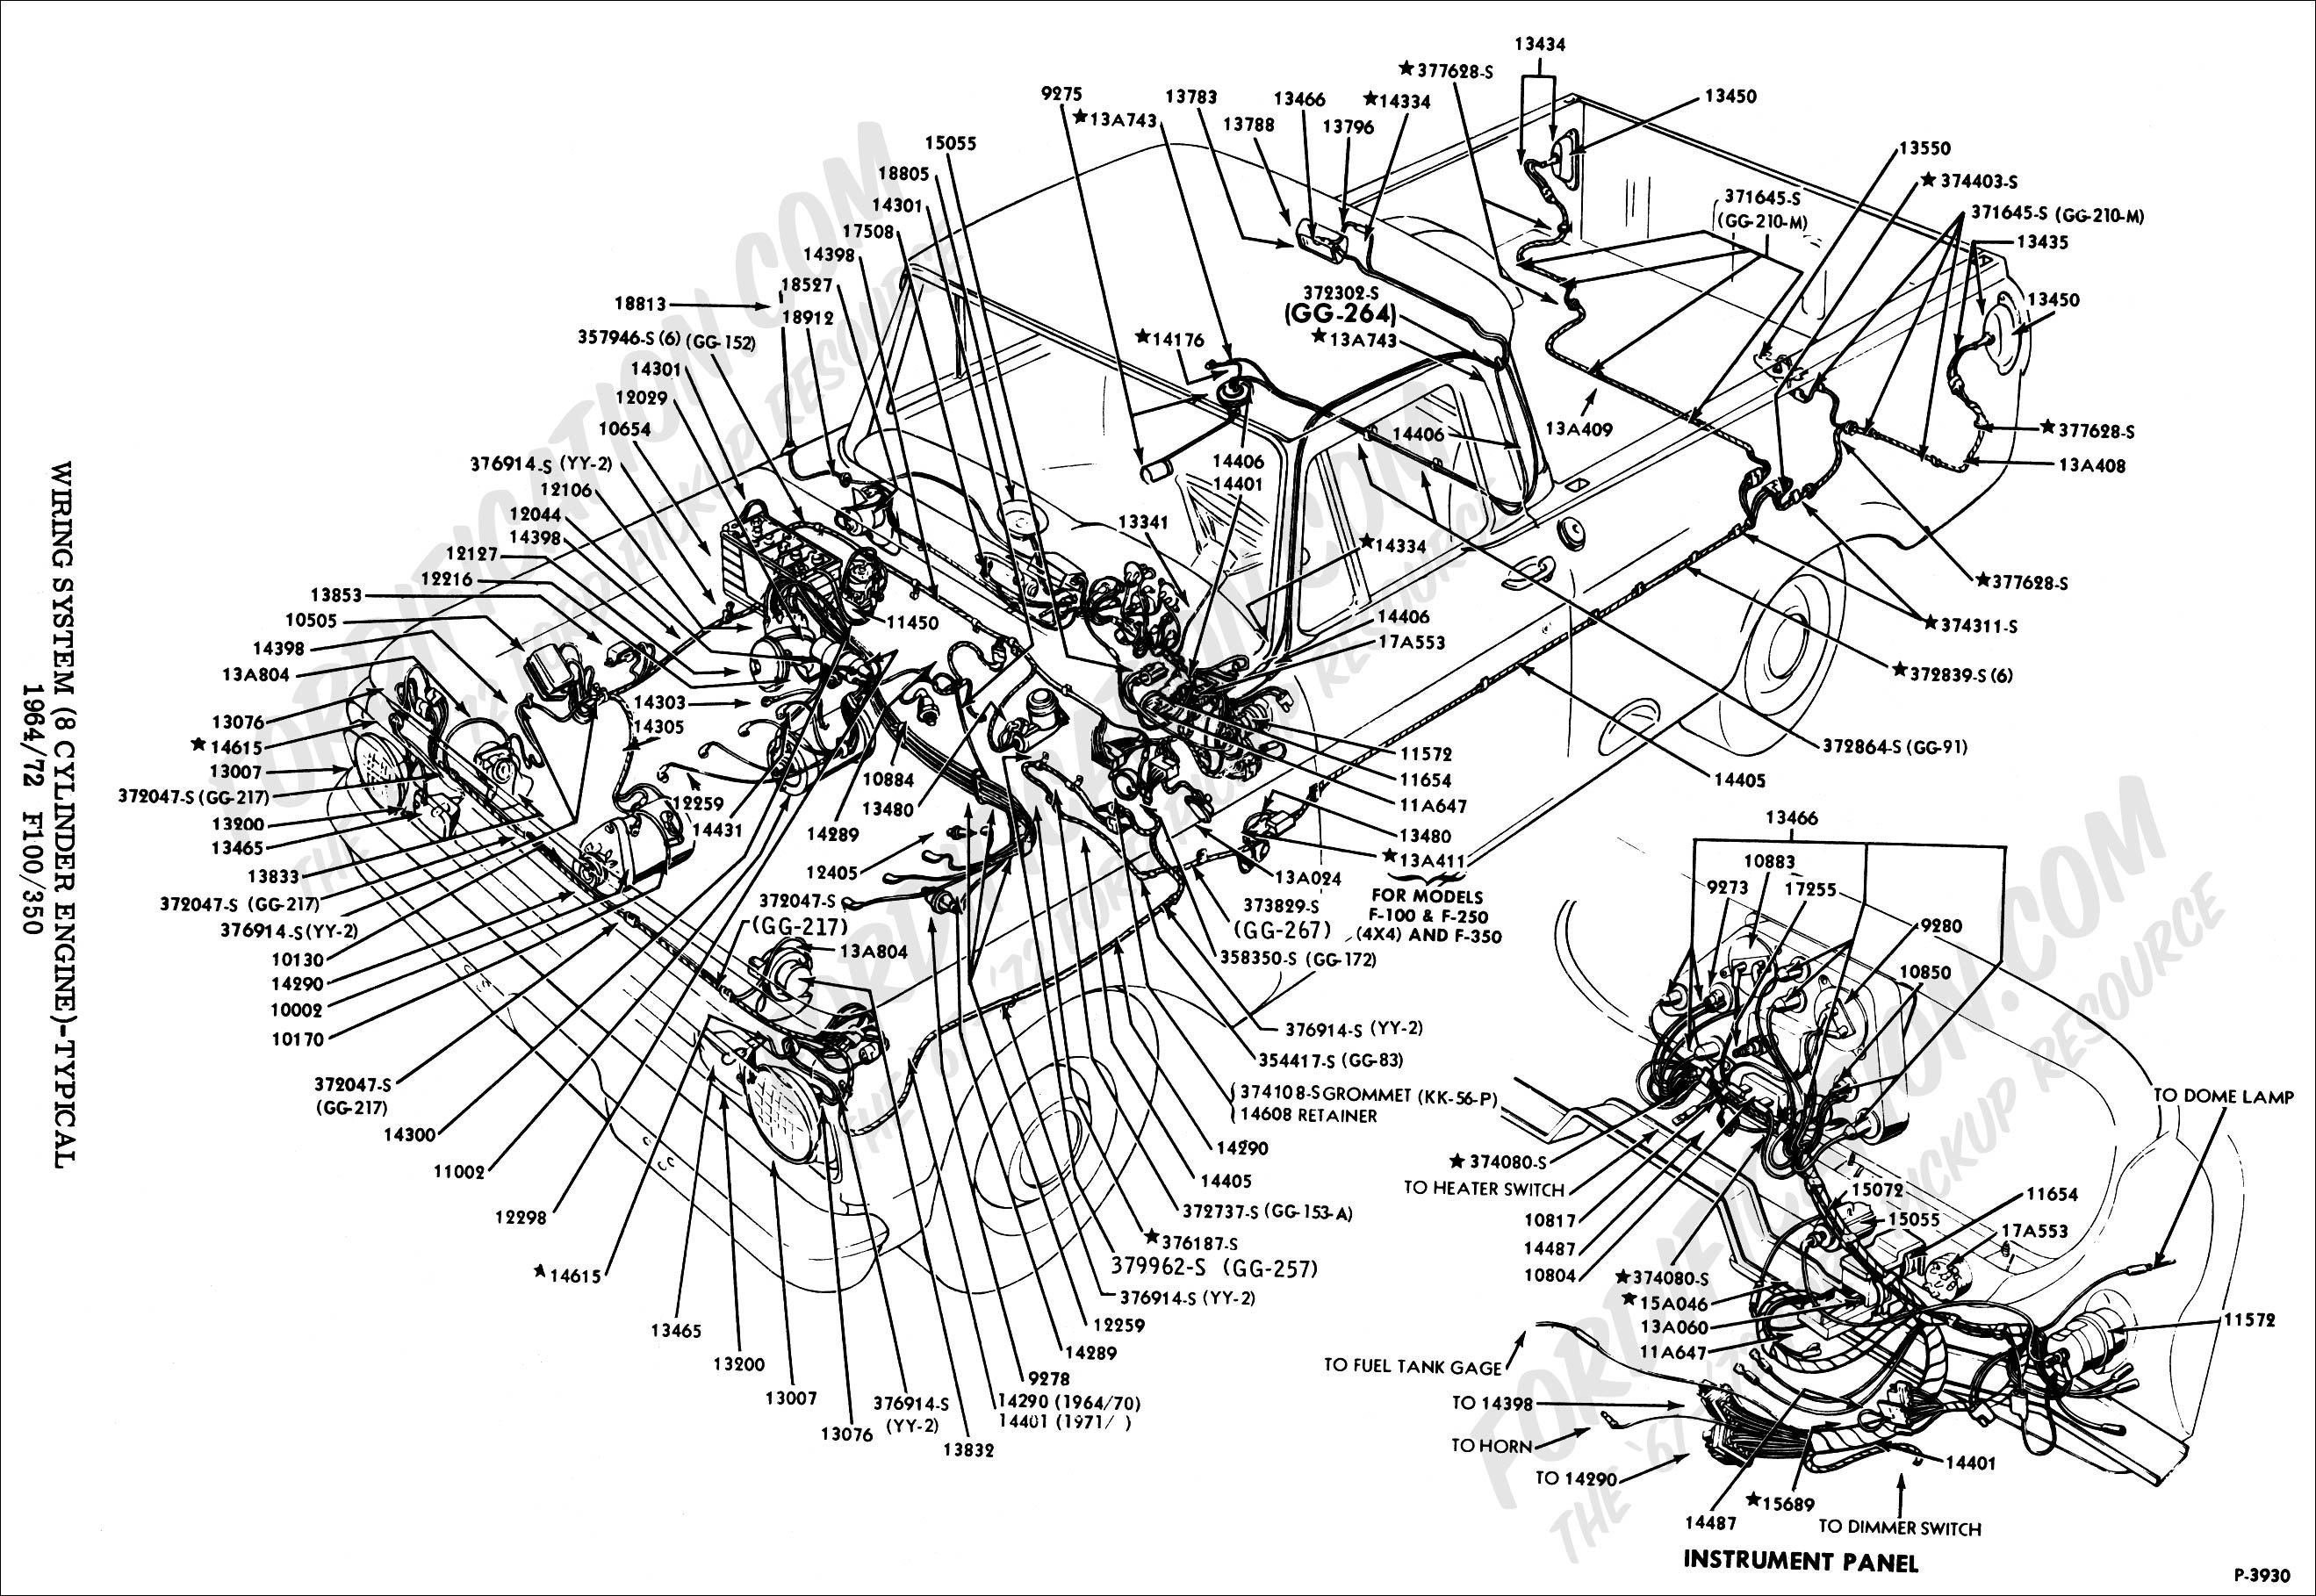 Terrific Ford Pickup Wiring Diagrams Basic Electronics Wiring Diagram Wiring Cloud Picalendutblikvittorg